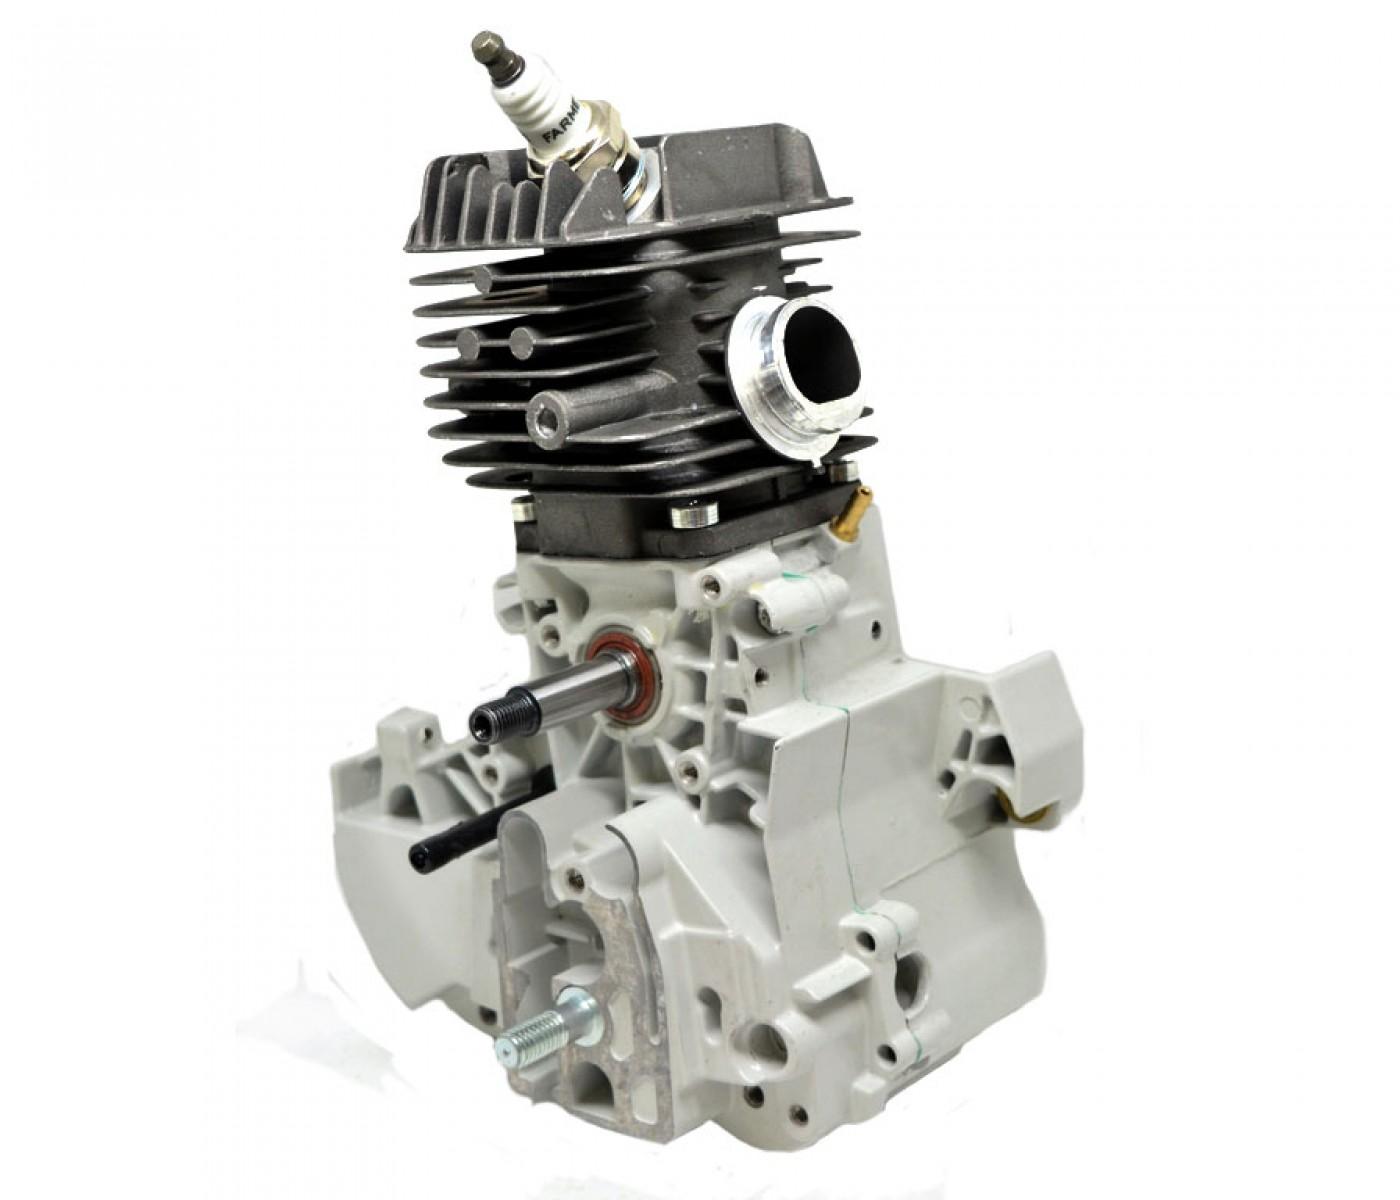 Motor Stihl MS200 MS200T 020T